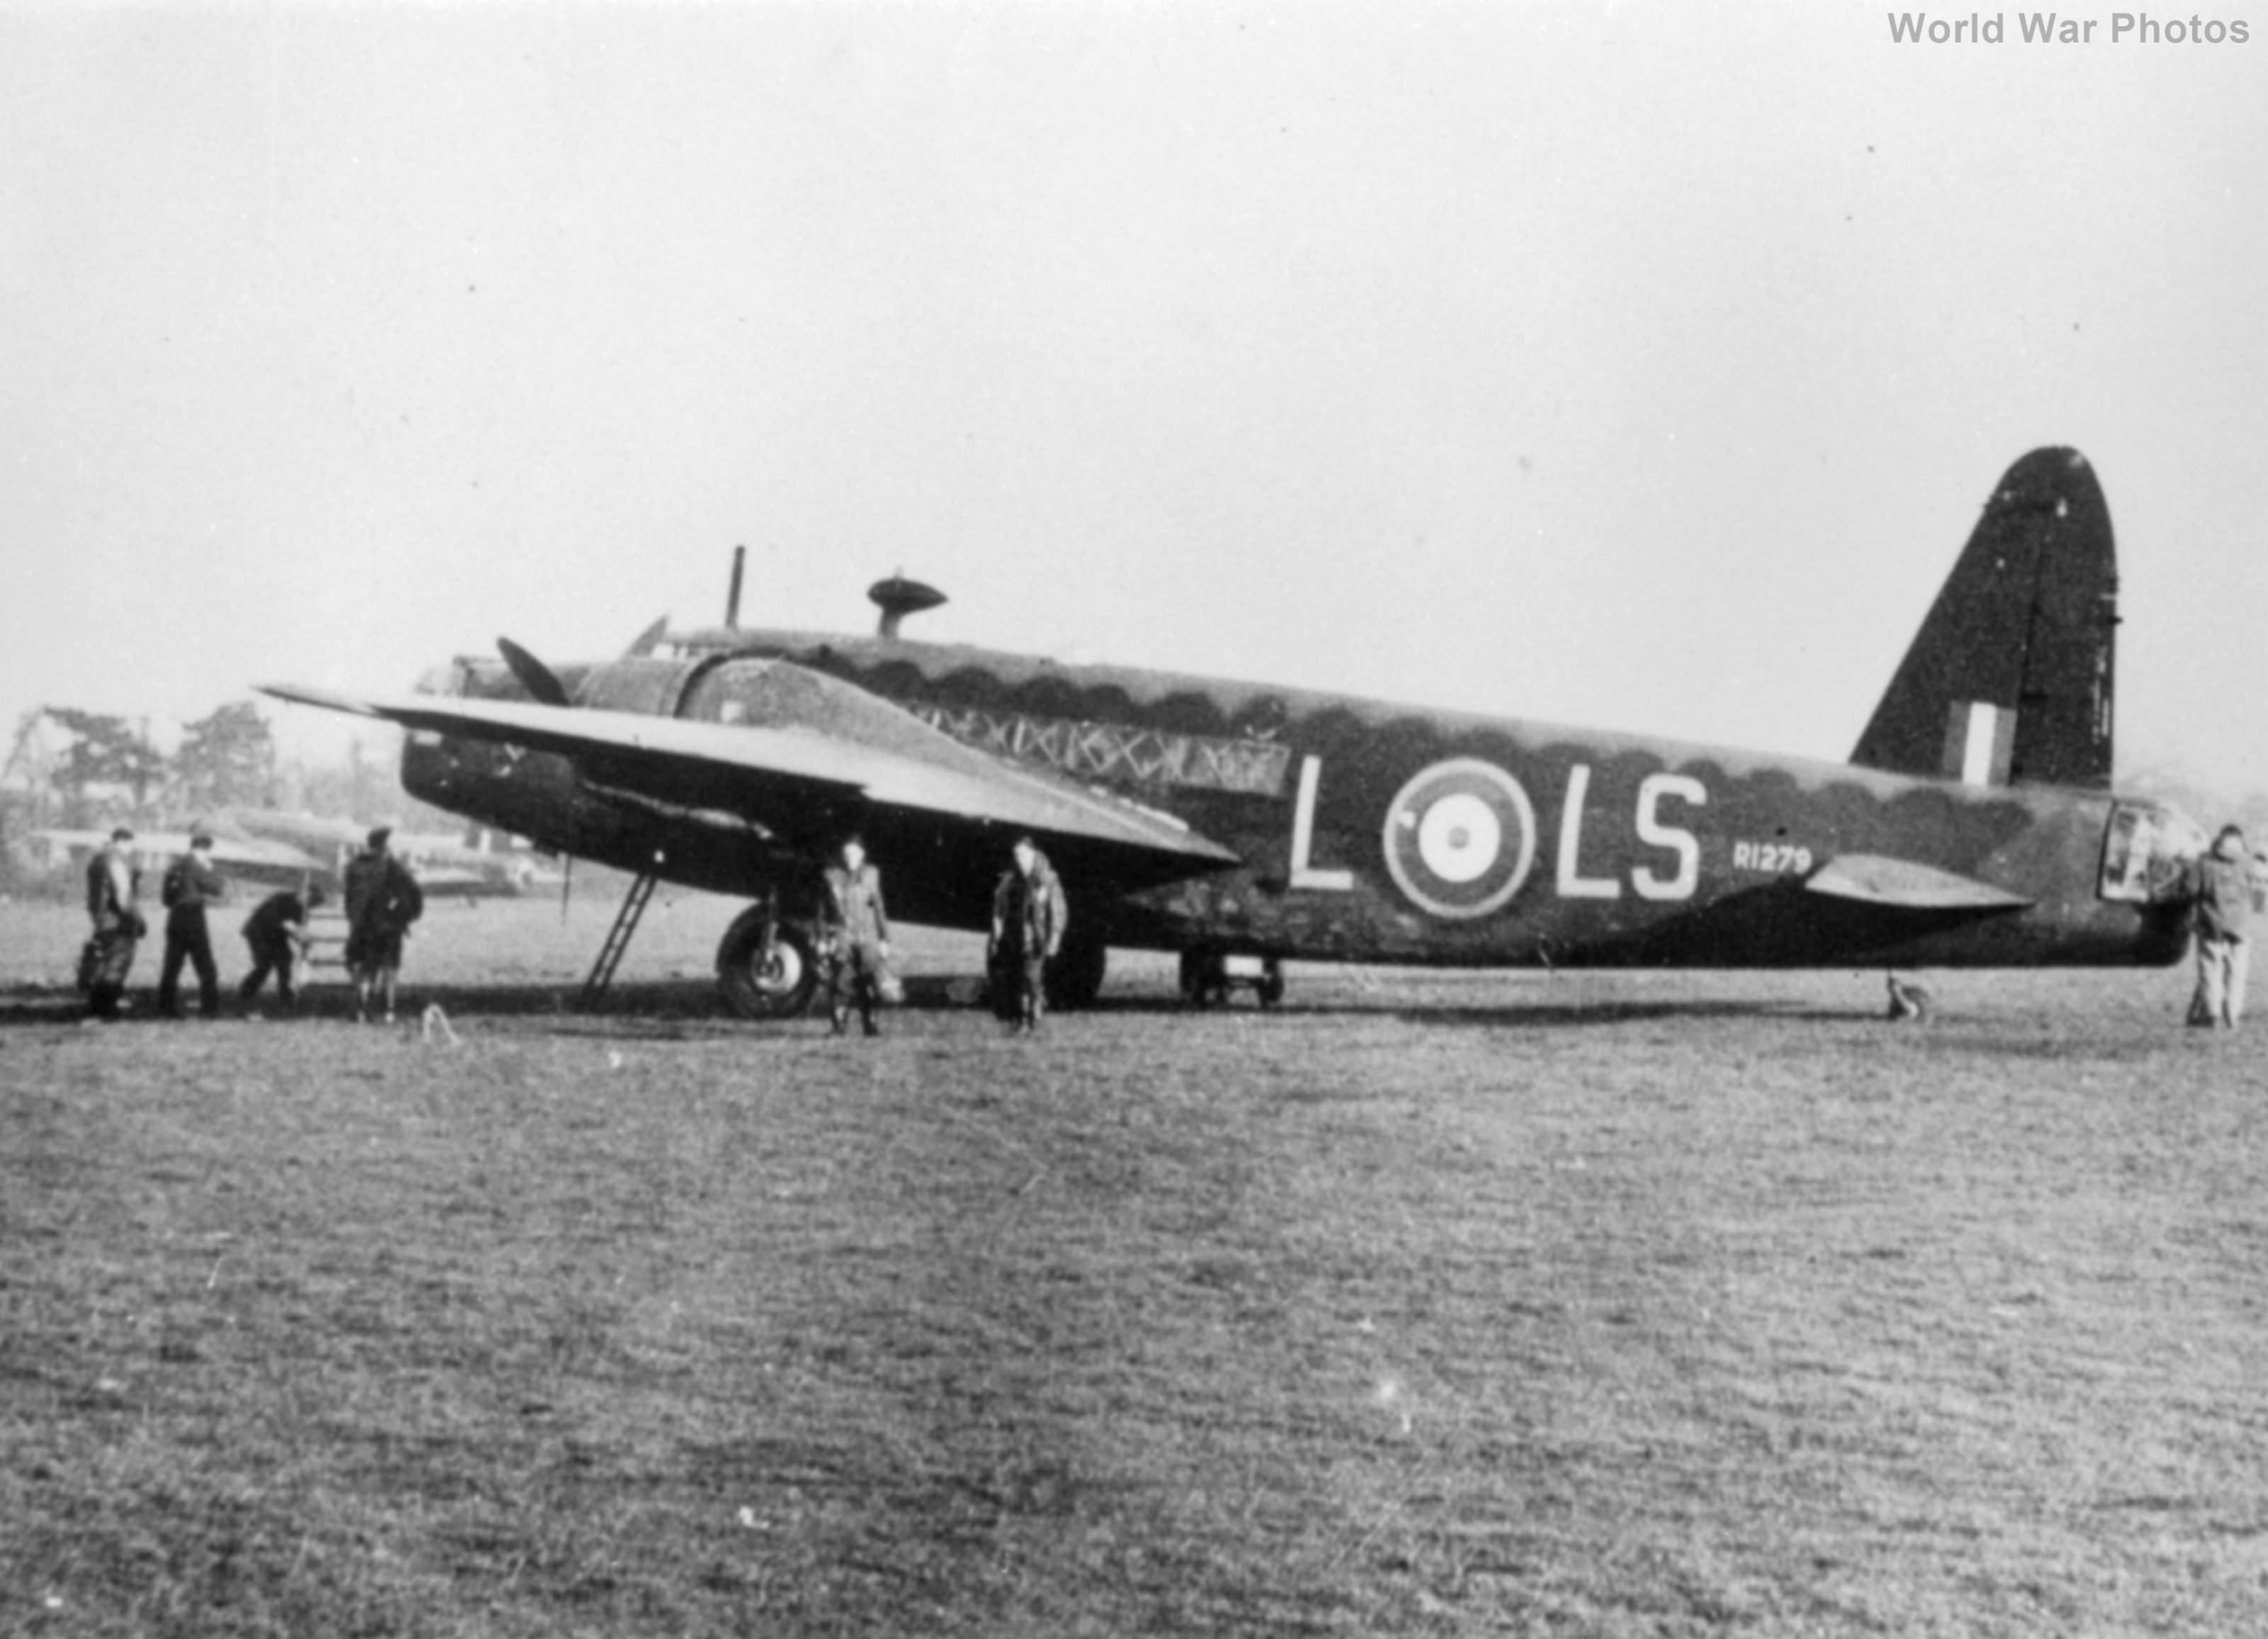 15 Squadron Wellington